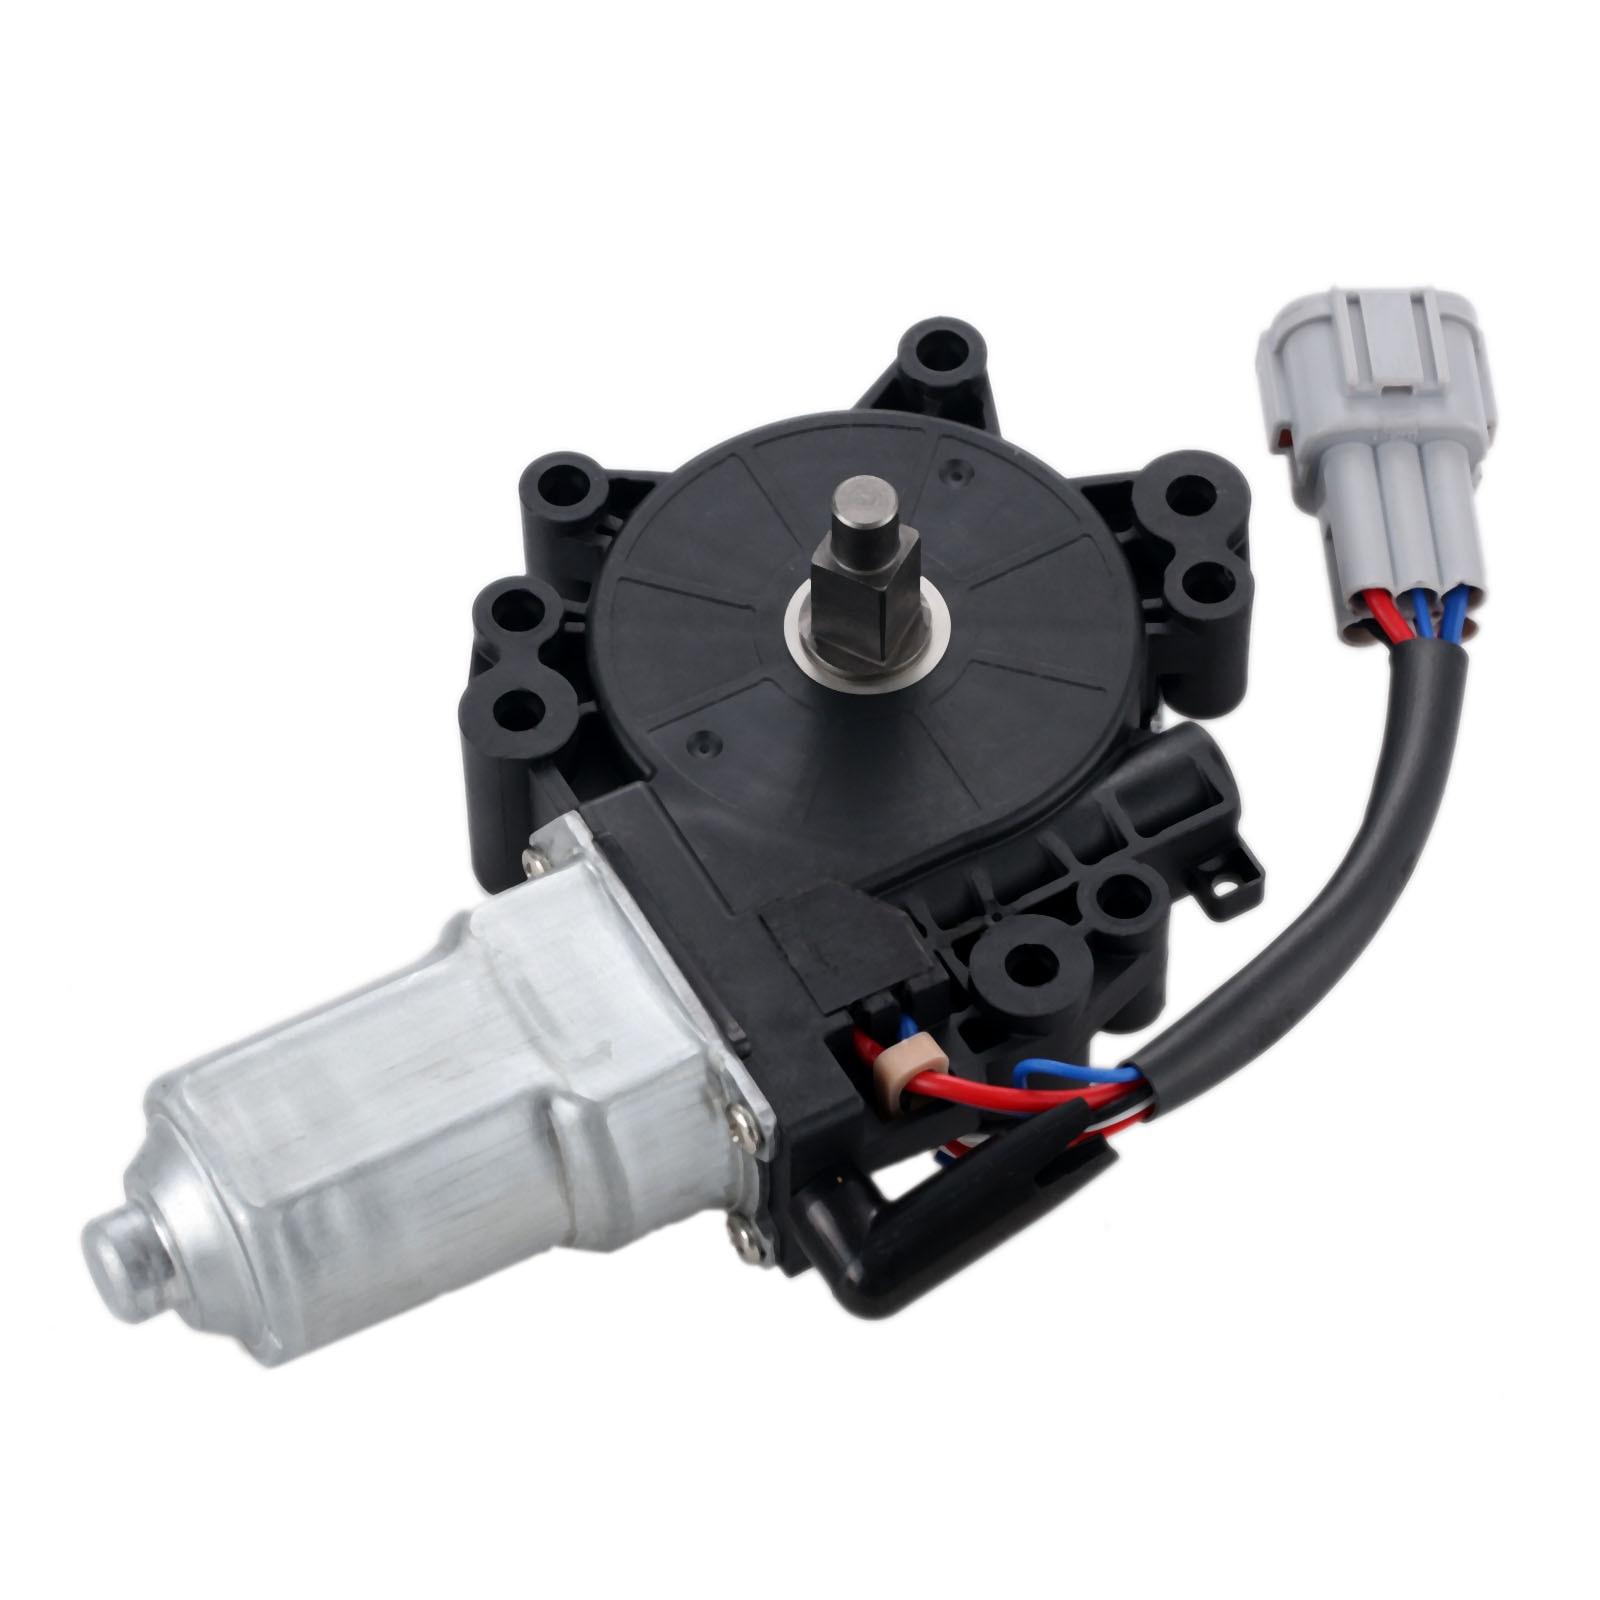 Yetaha Front Driver Side Power Window Lift Motor For Nissan Pathfinder Armada Titan QX56 807319FJ0A 80731-ZT01A 80730-ZM70B